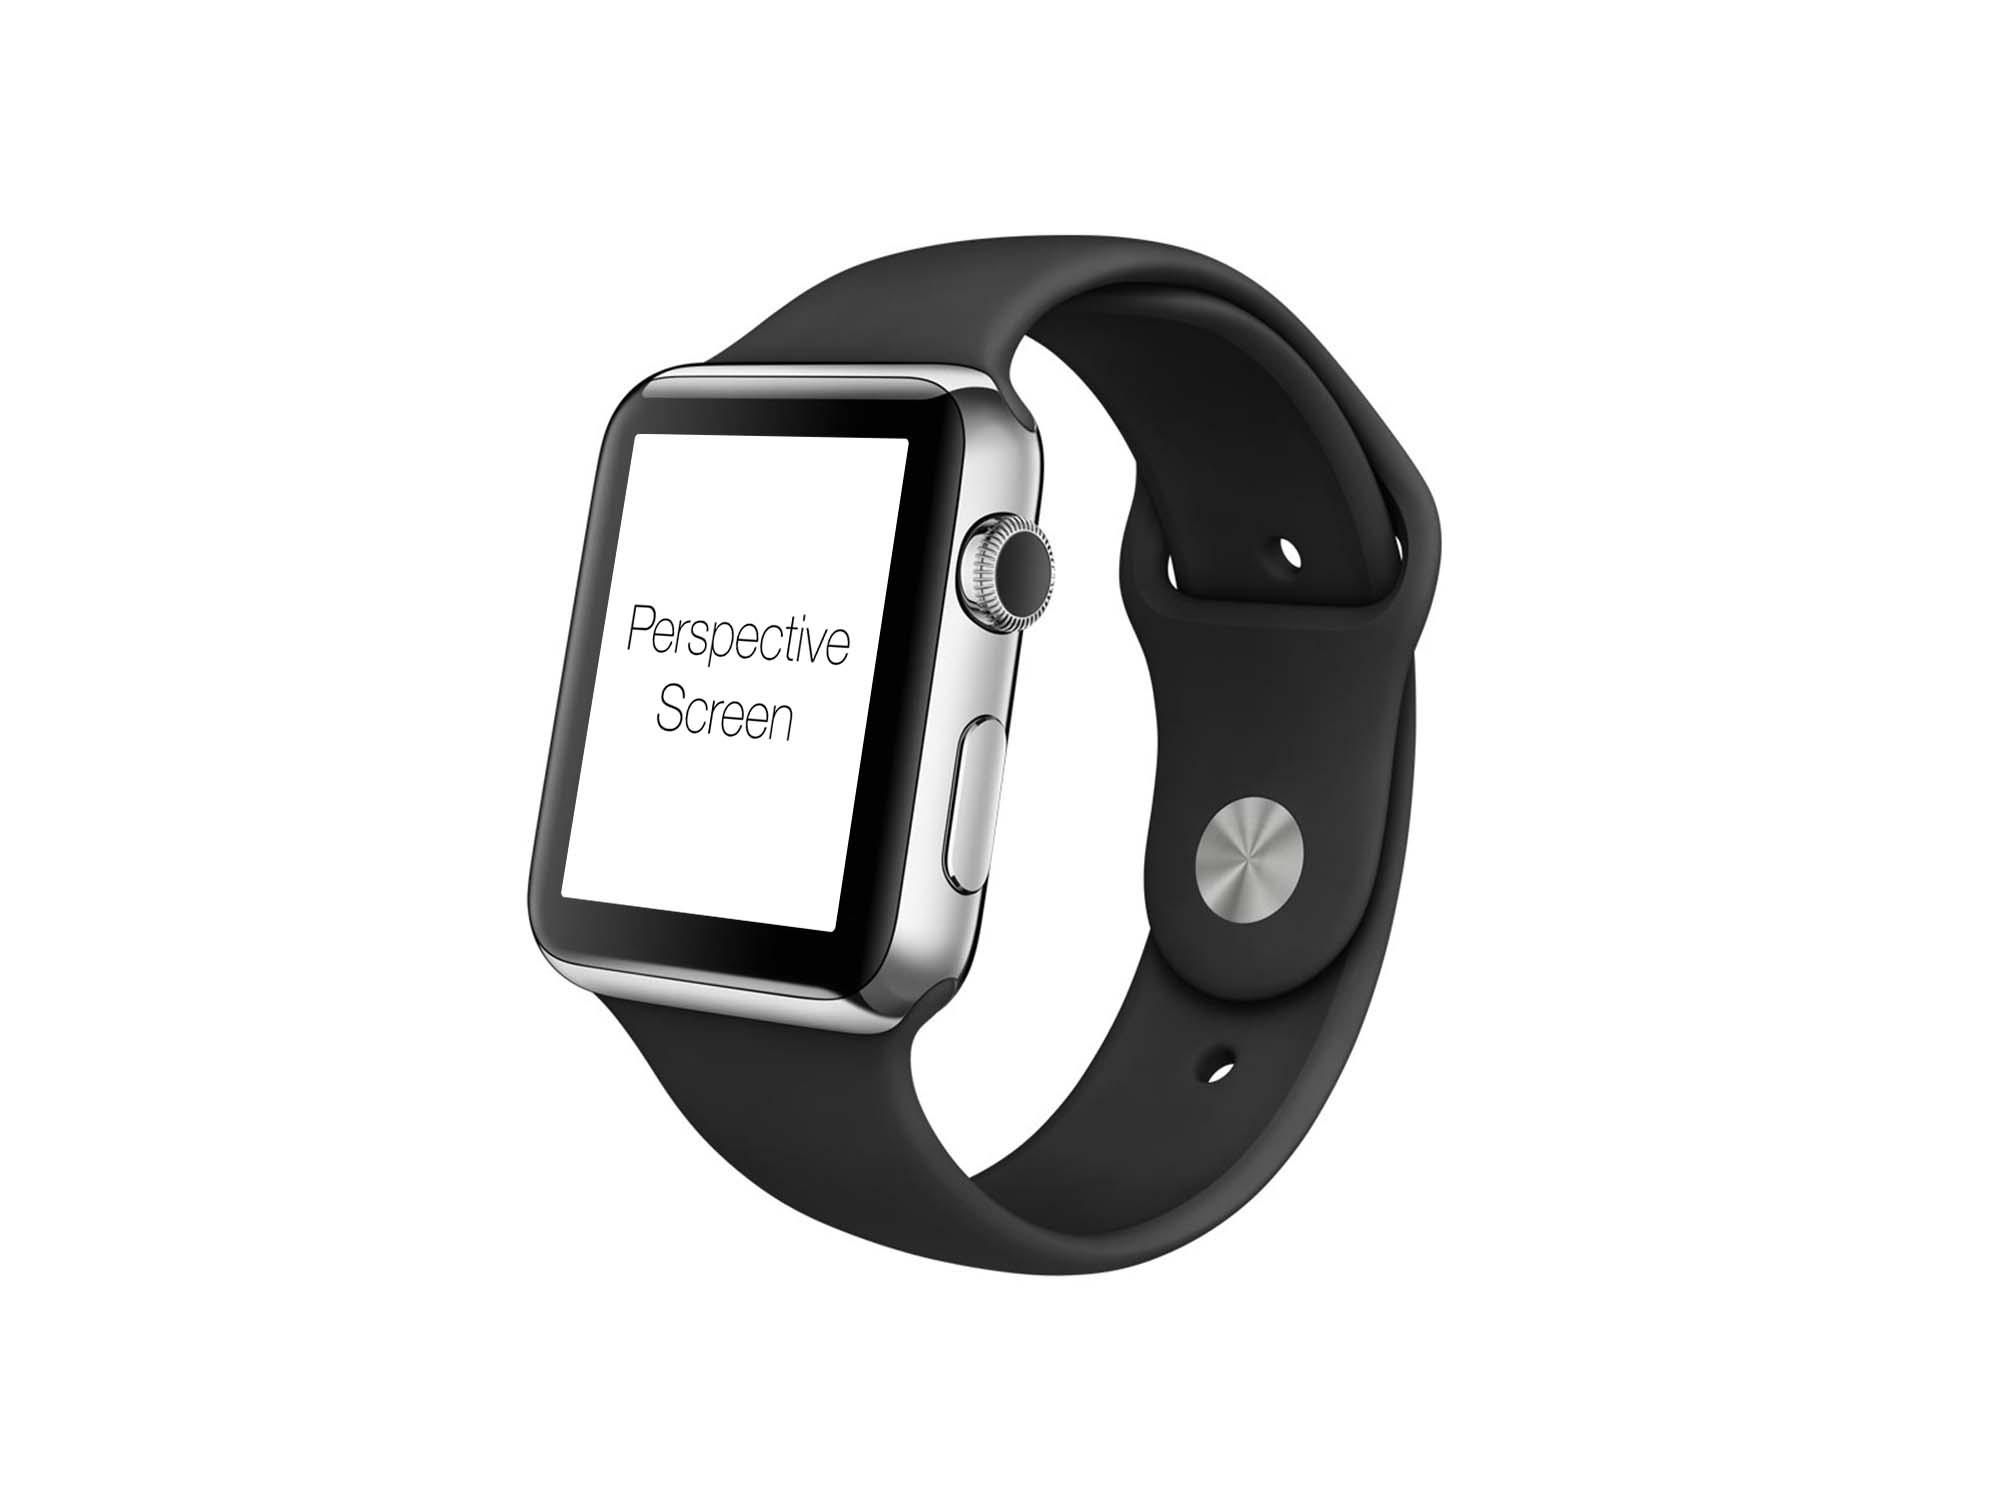 Apple Watch Mockup Perspective